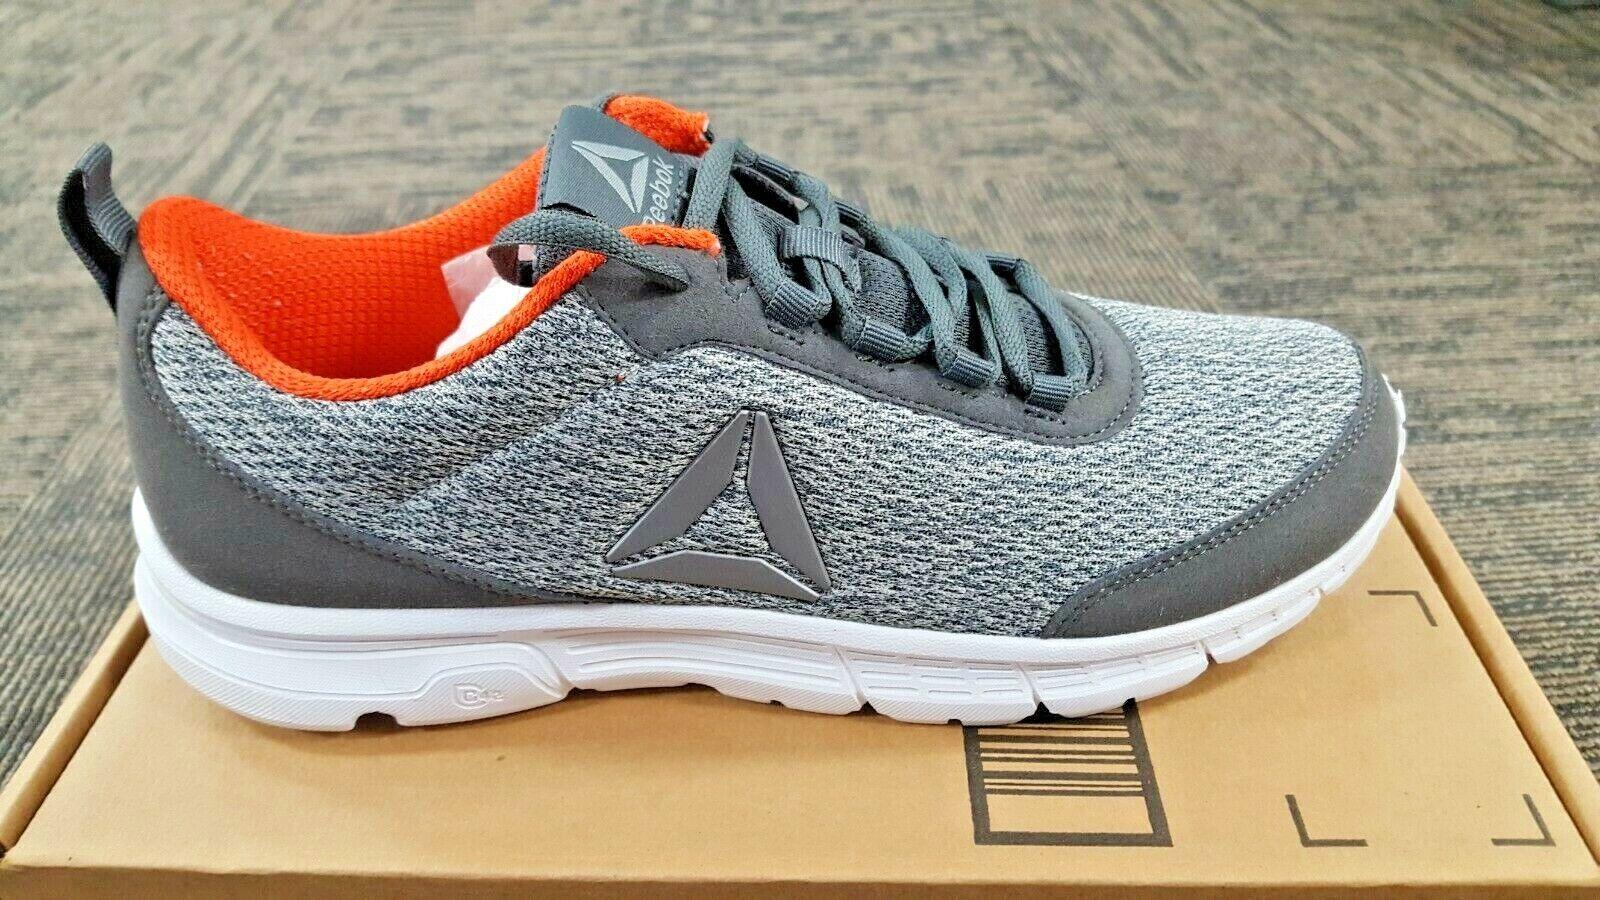 Reebok Speedlux 3.0 shoes - Men's Running SKU CN1433 Size 9.5